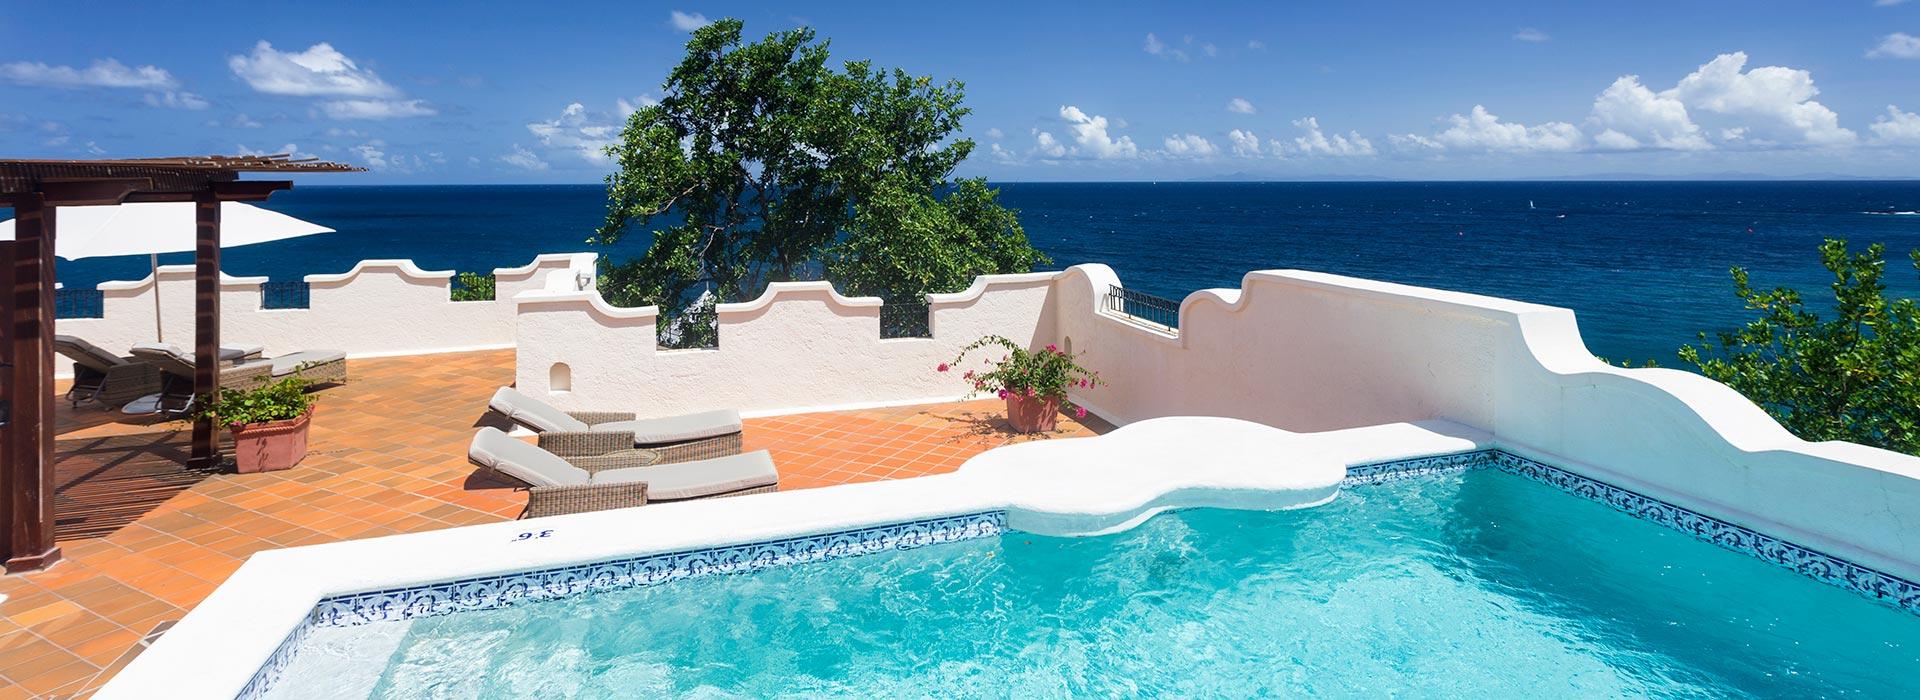 Cap-Maison-Ocean-View-Suite-Pool